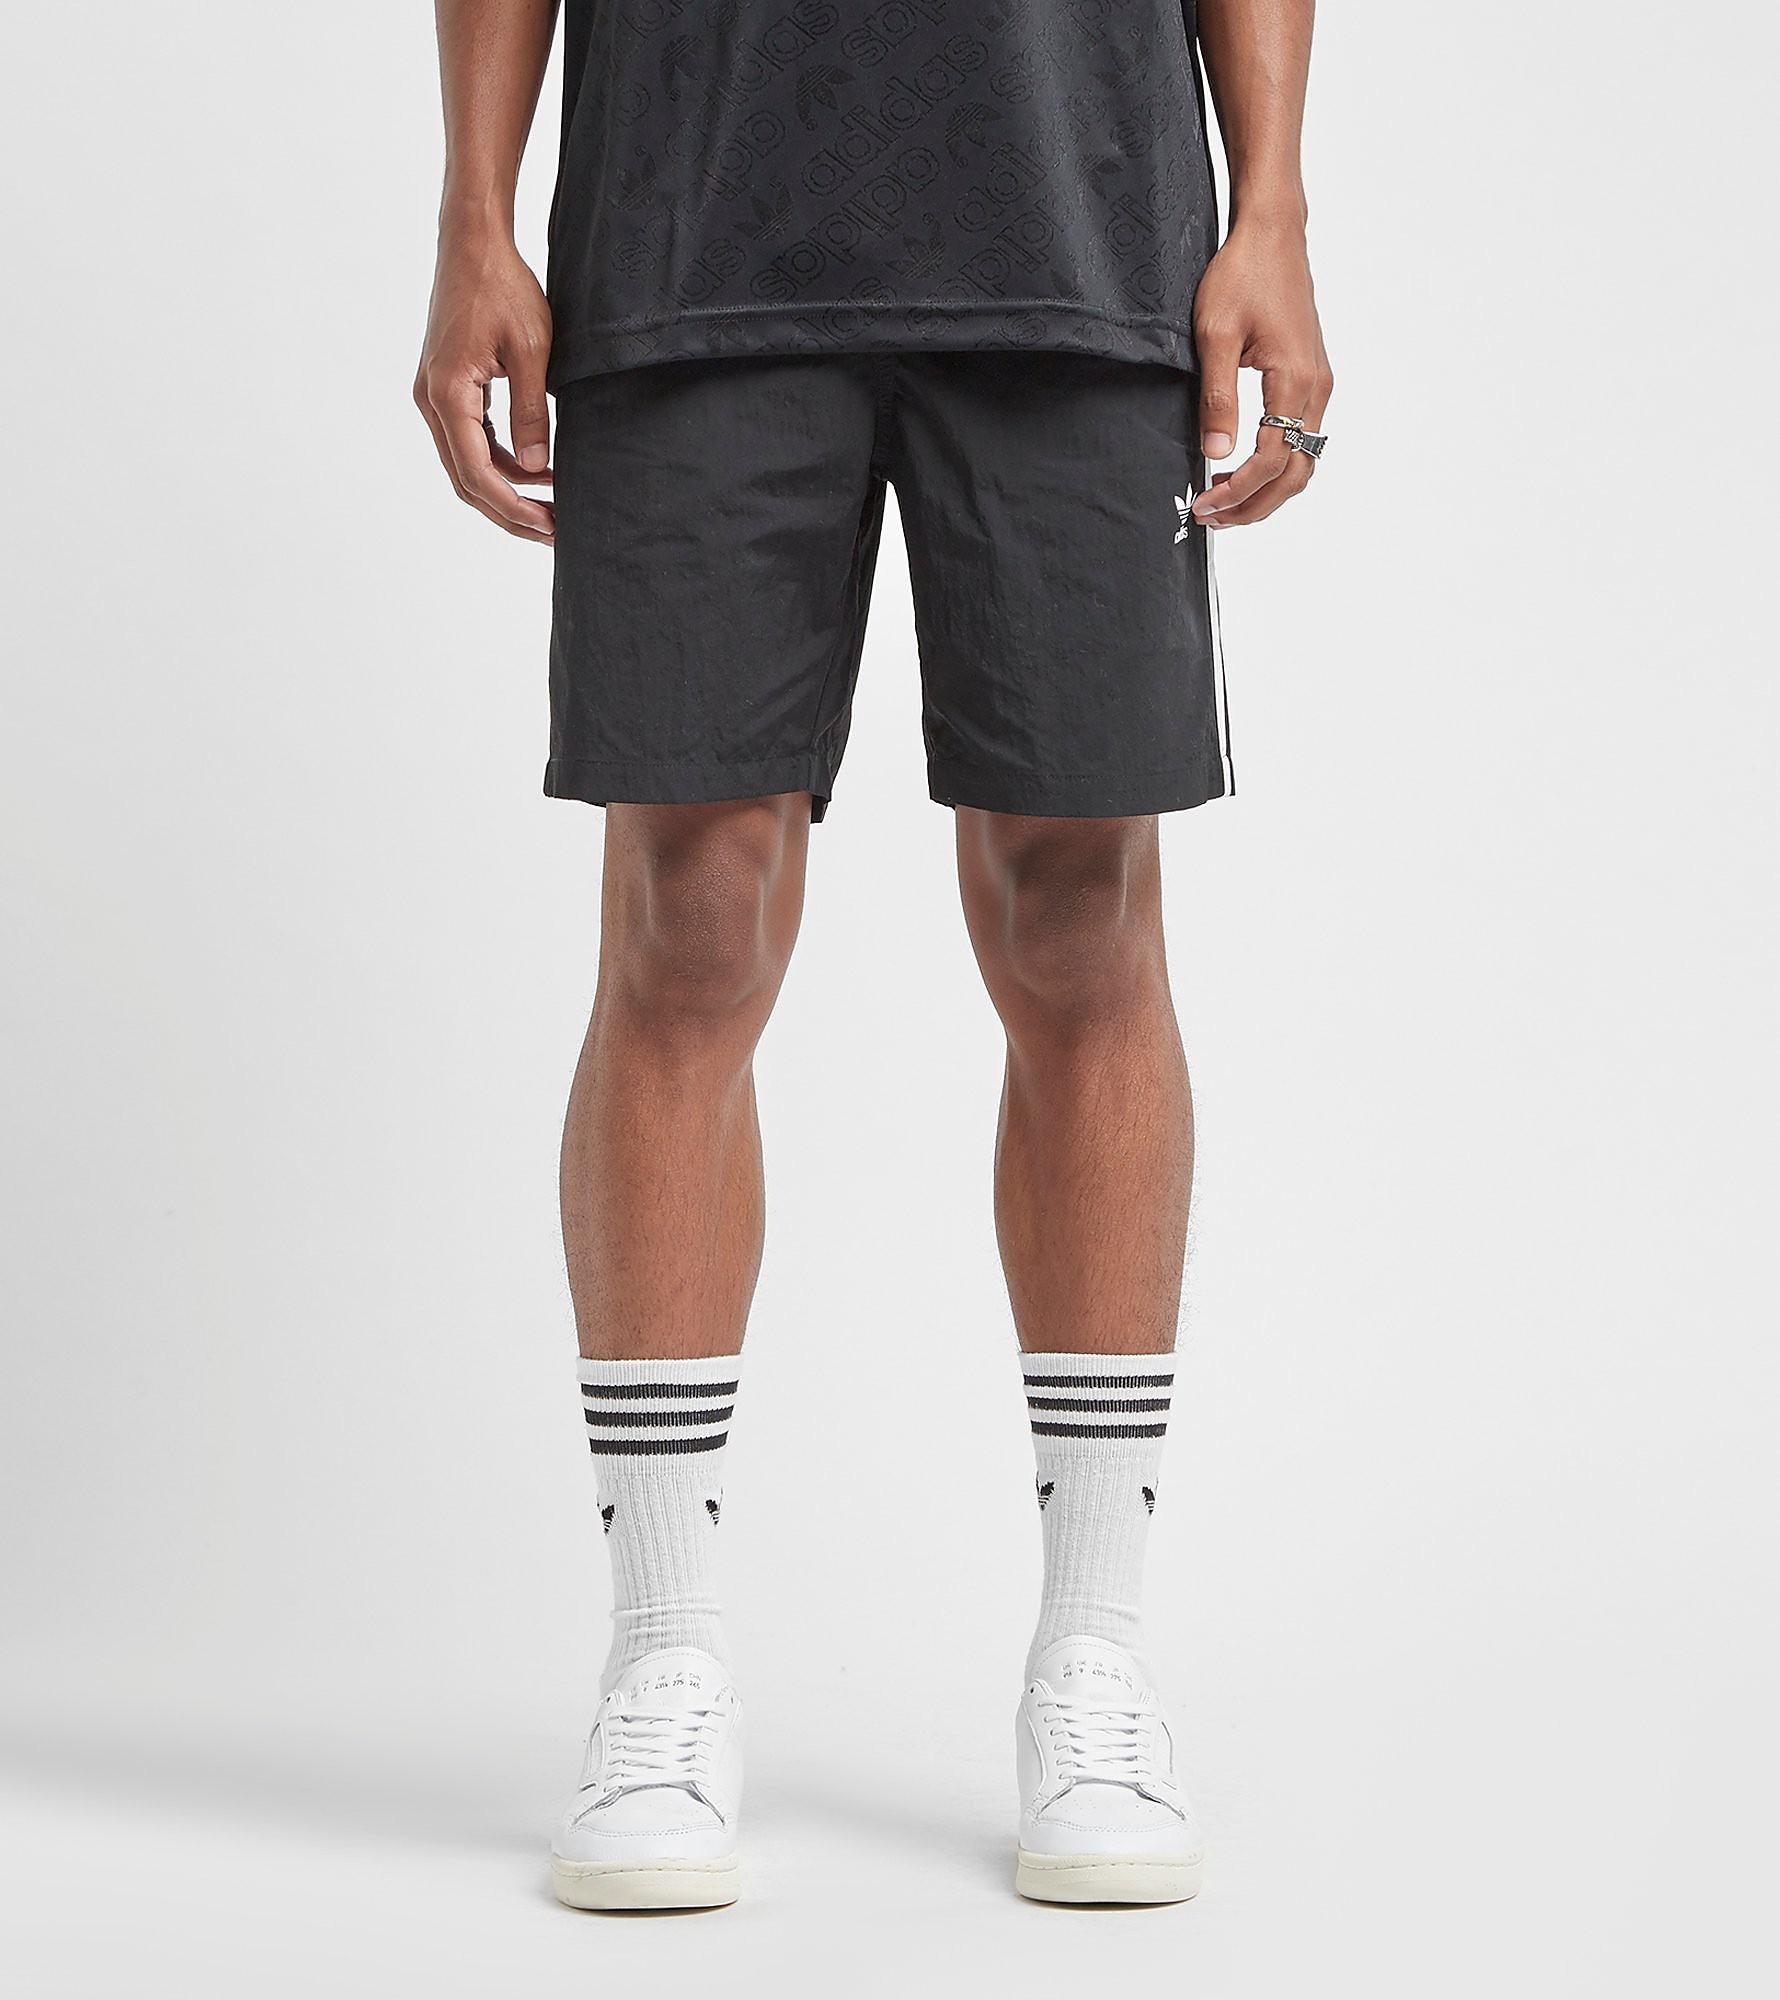 adidas Originals 3-Stripes Swim Shorts, Black